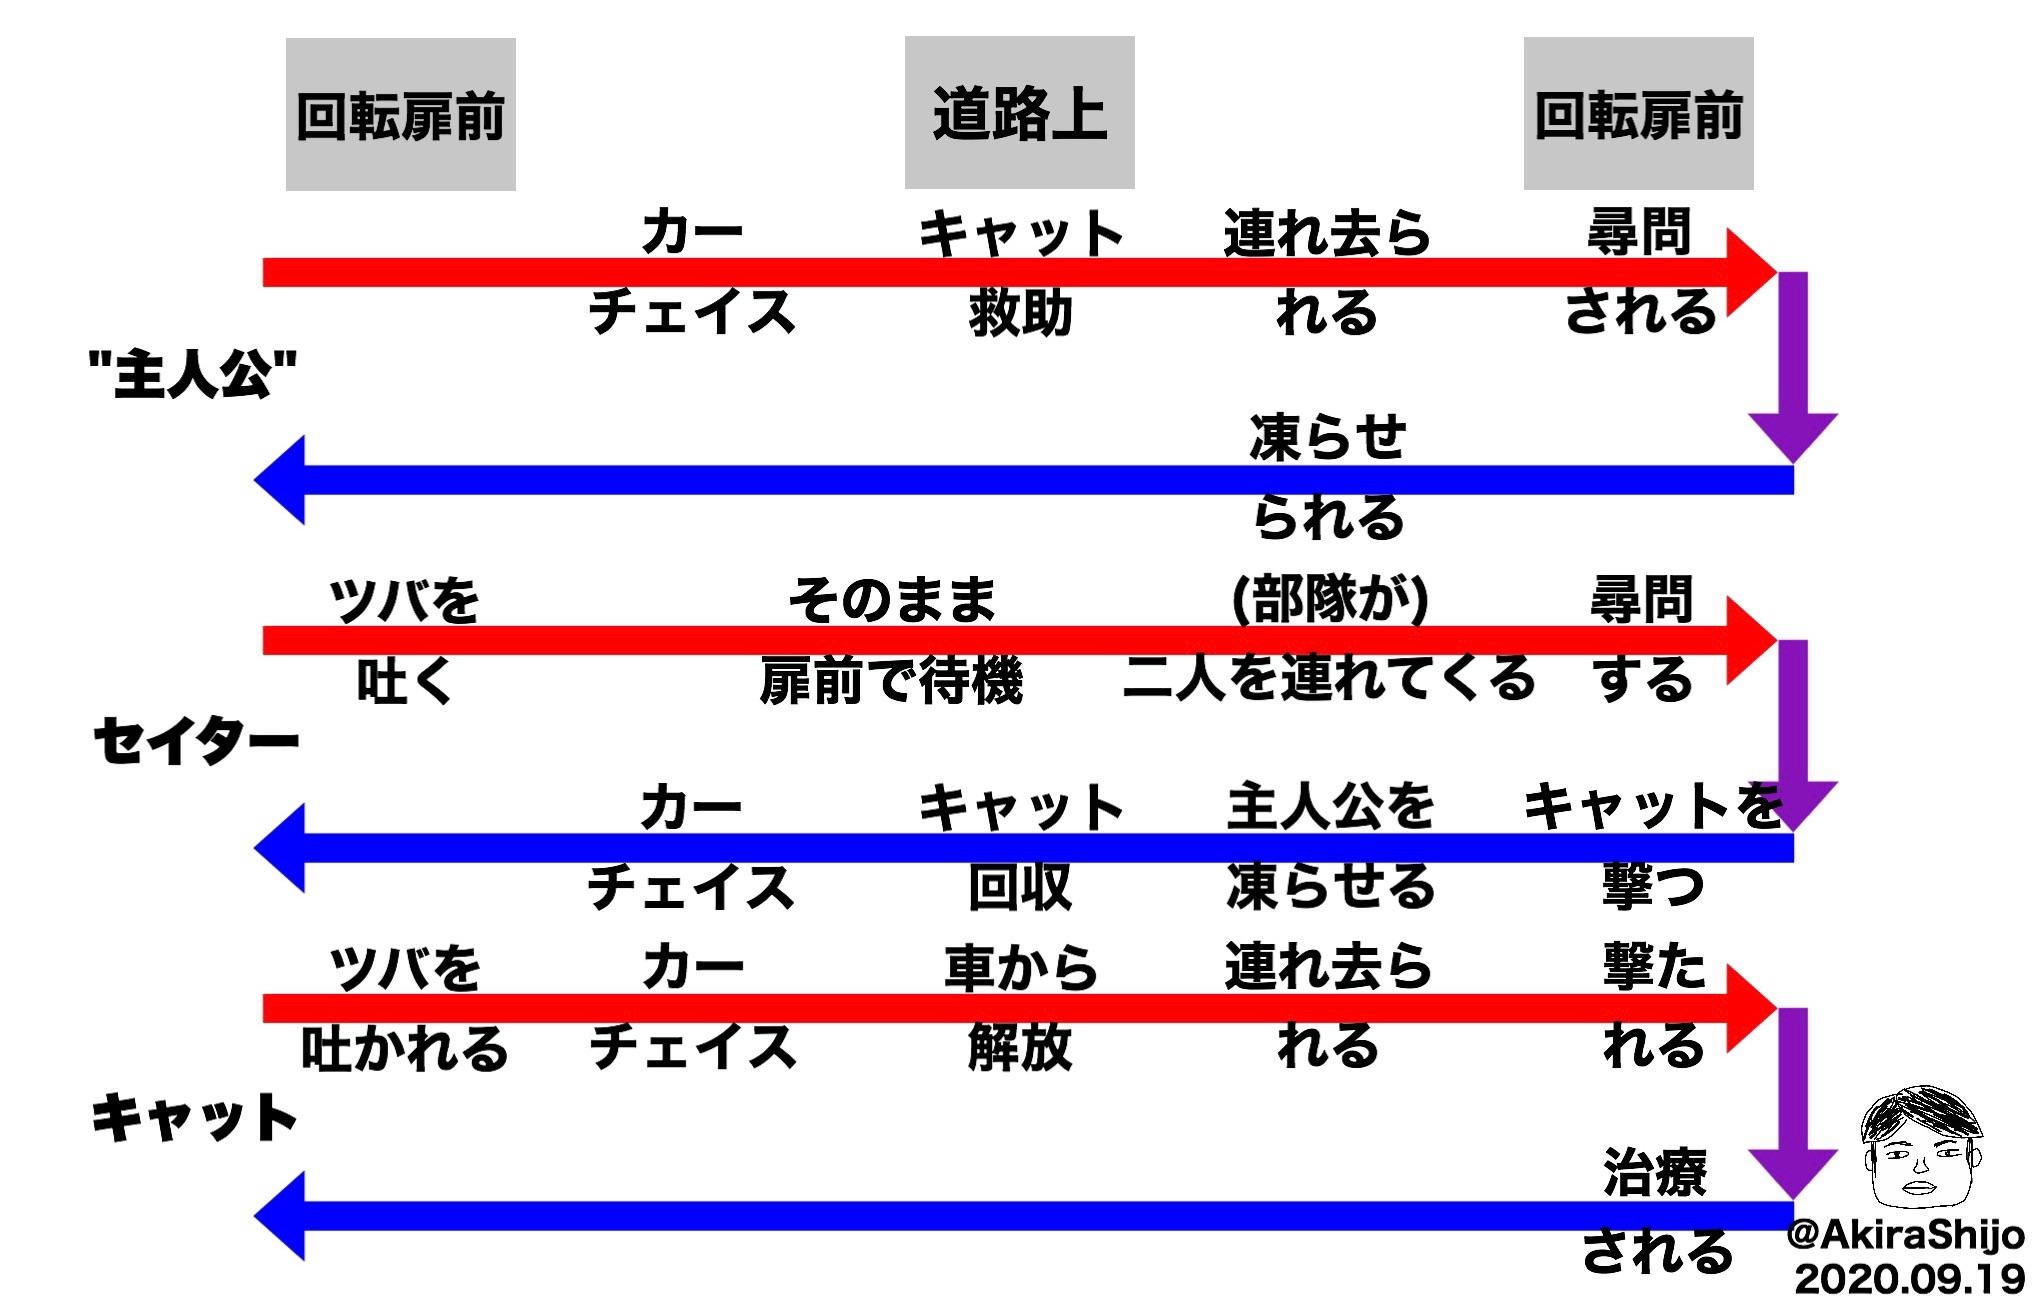 f:id:AkiraShijo:20200923044801j:image